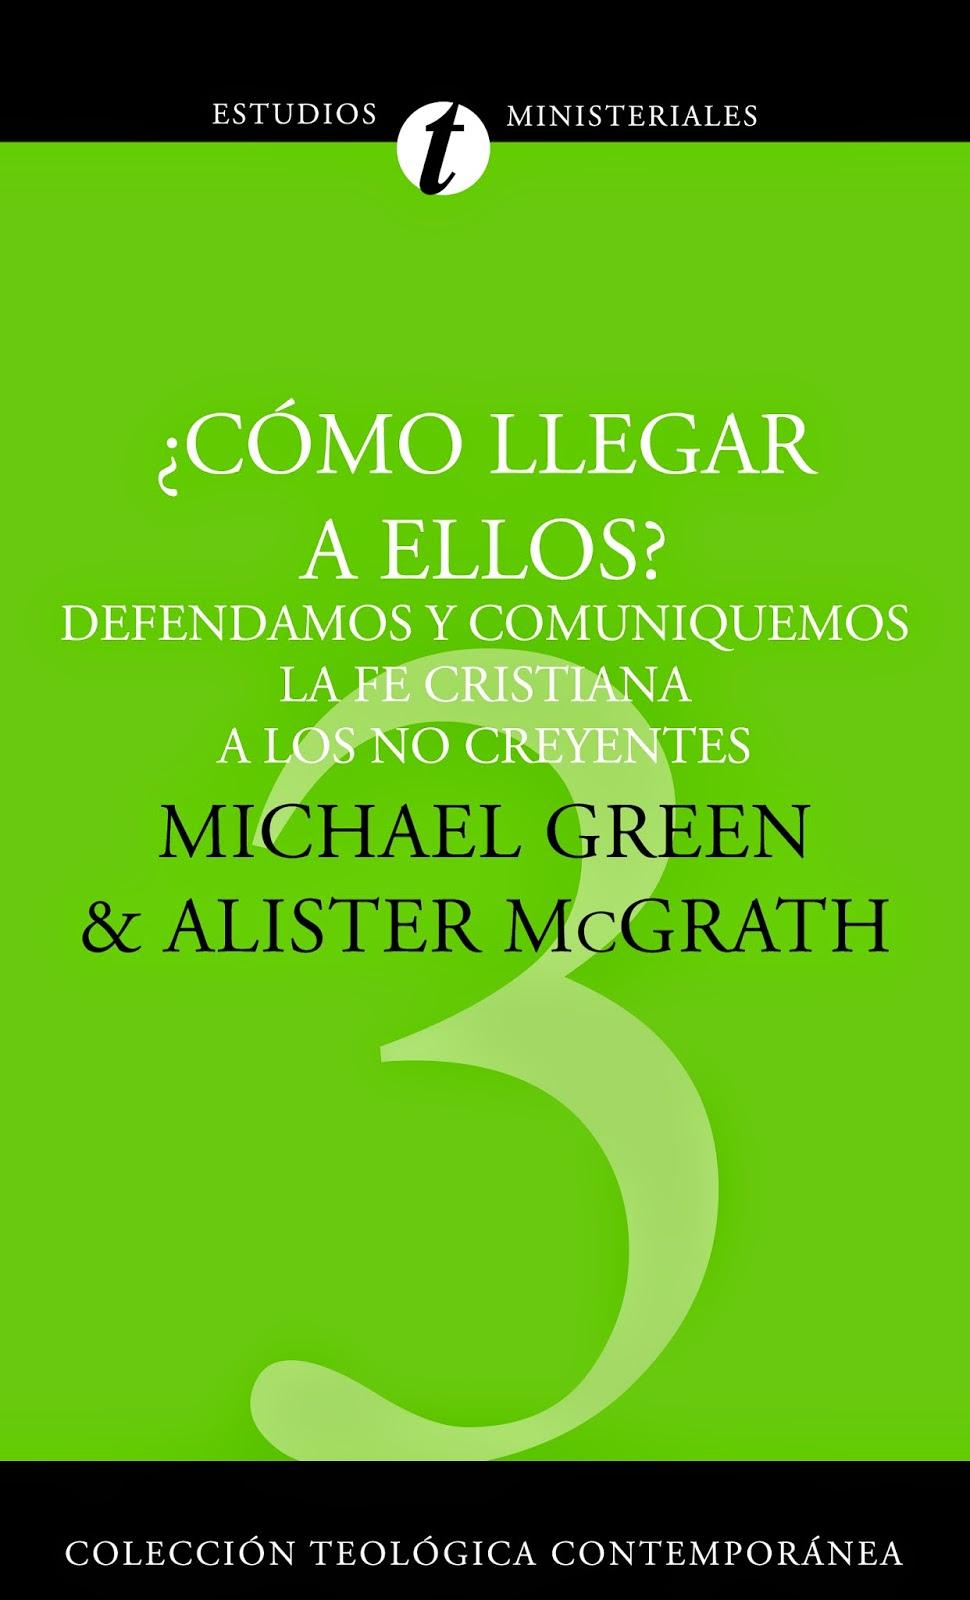 Michael Green & Alister McGrath-¿Cómo Llegar a Ellos?-